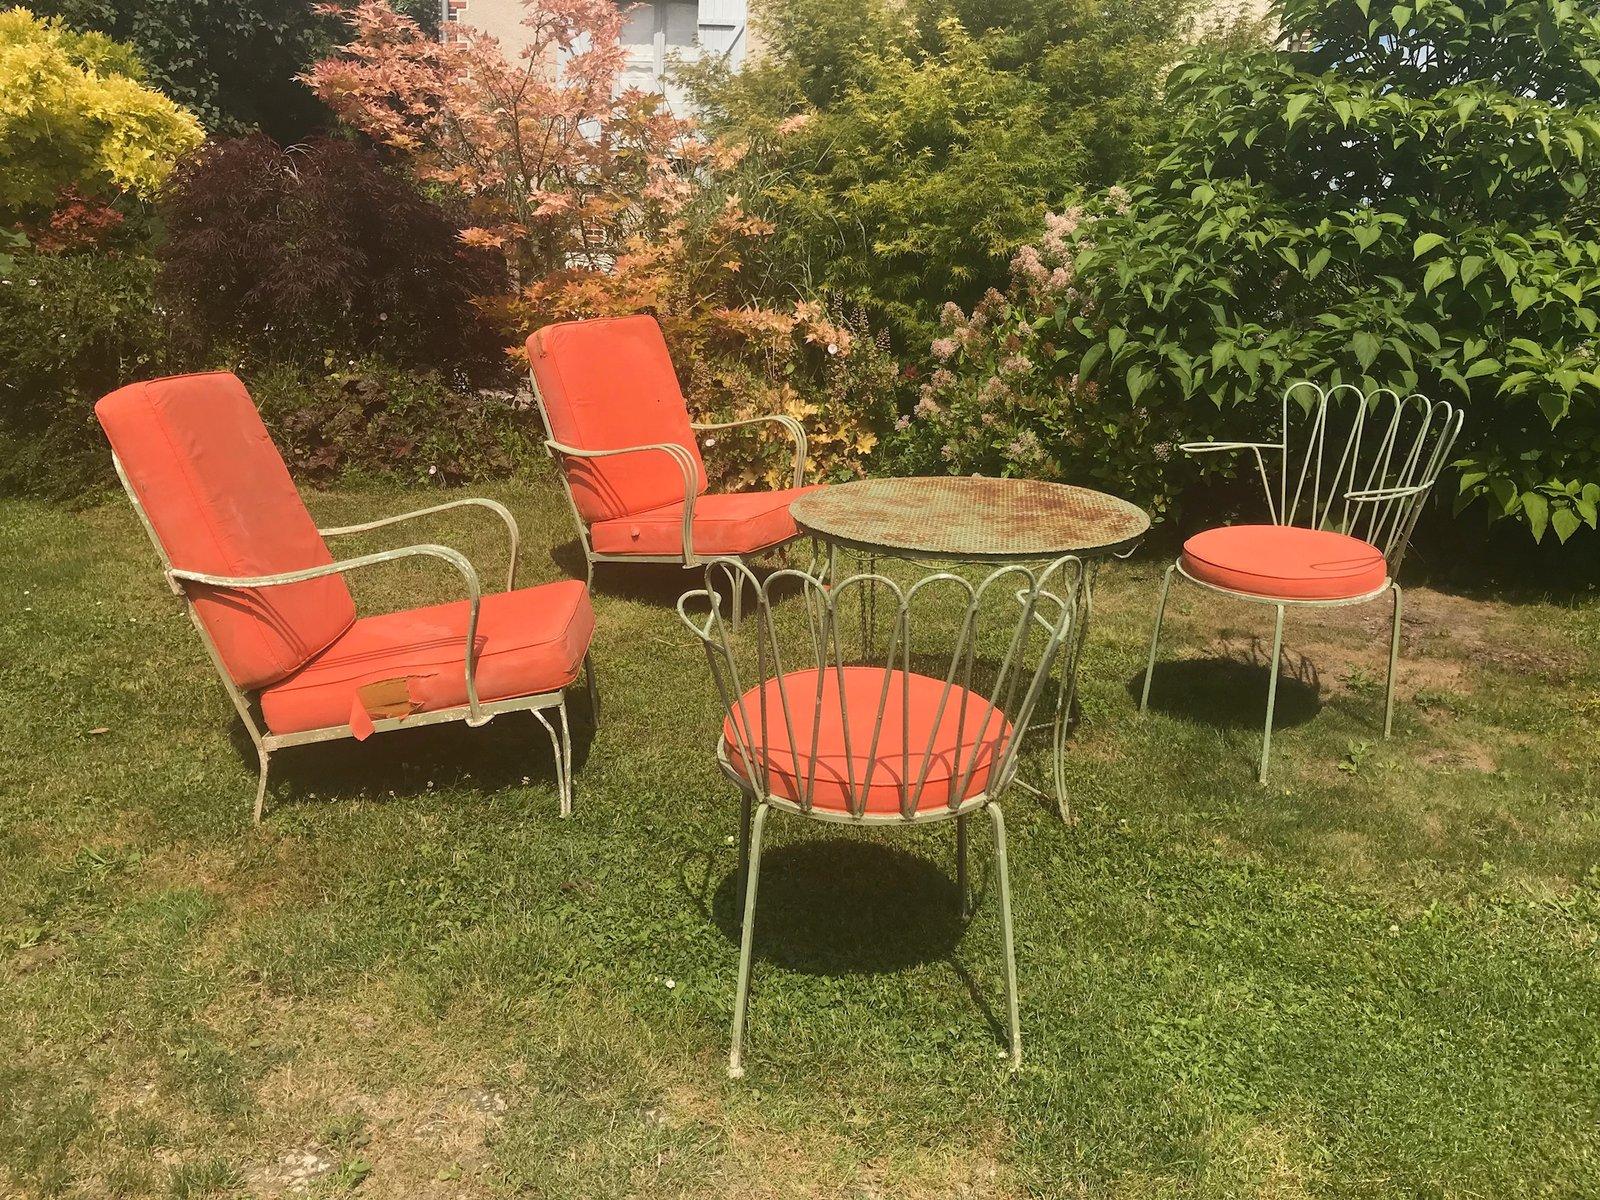 Sedie Francesi Da Giardino : Sedie francesi da giardino sedie e sgabelli d antiquariato da